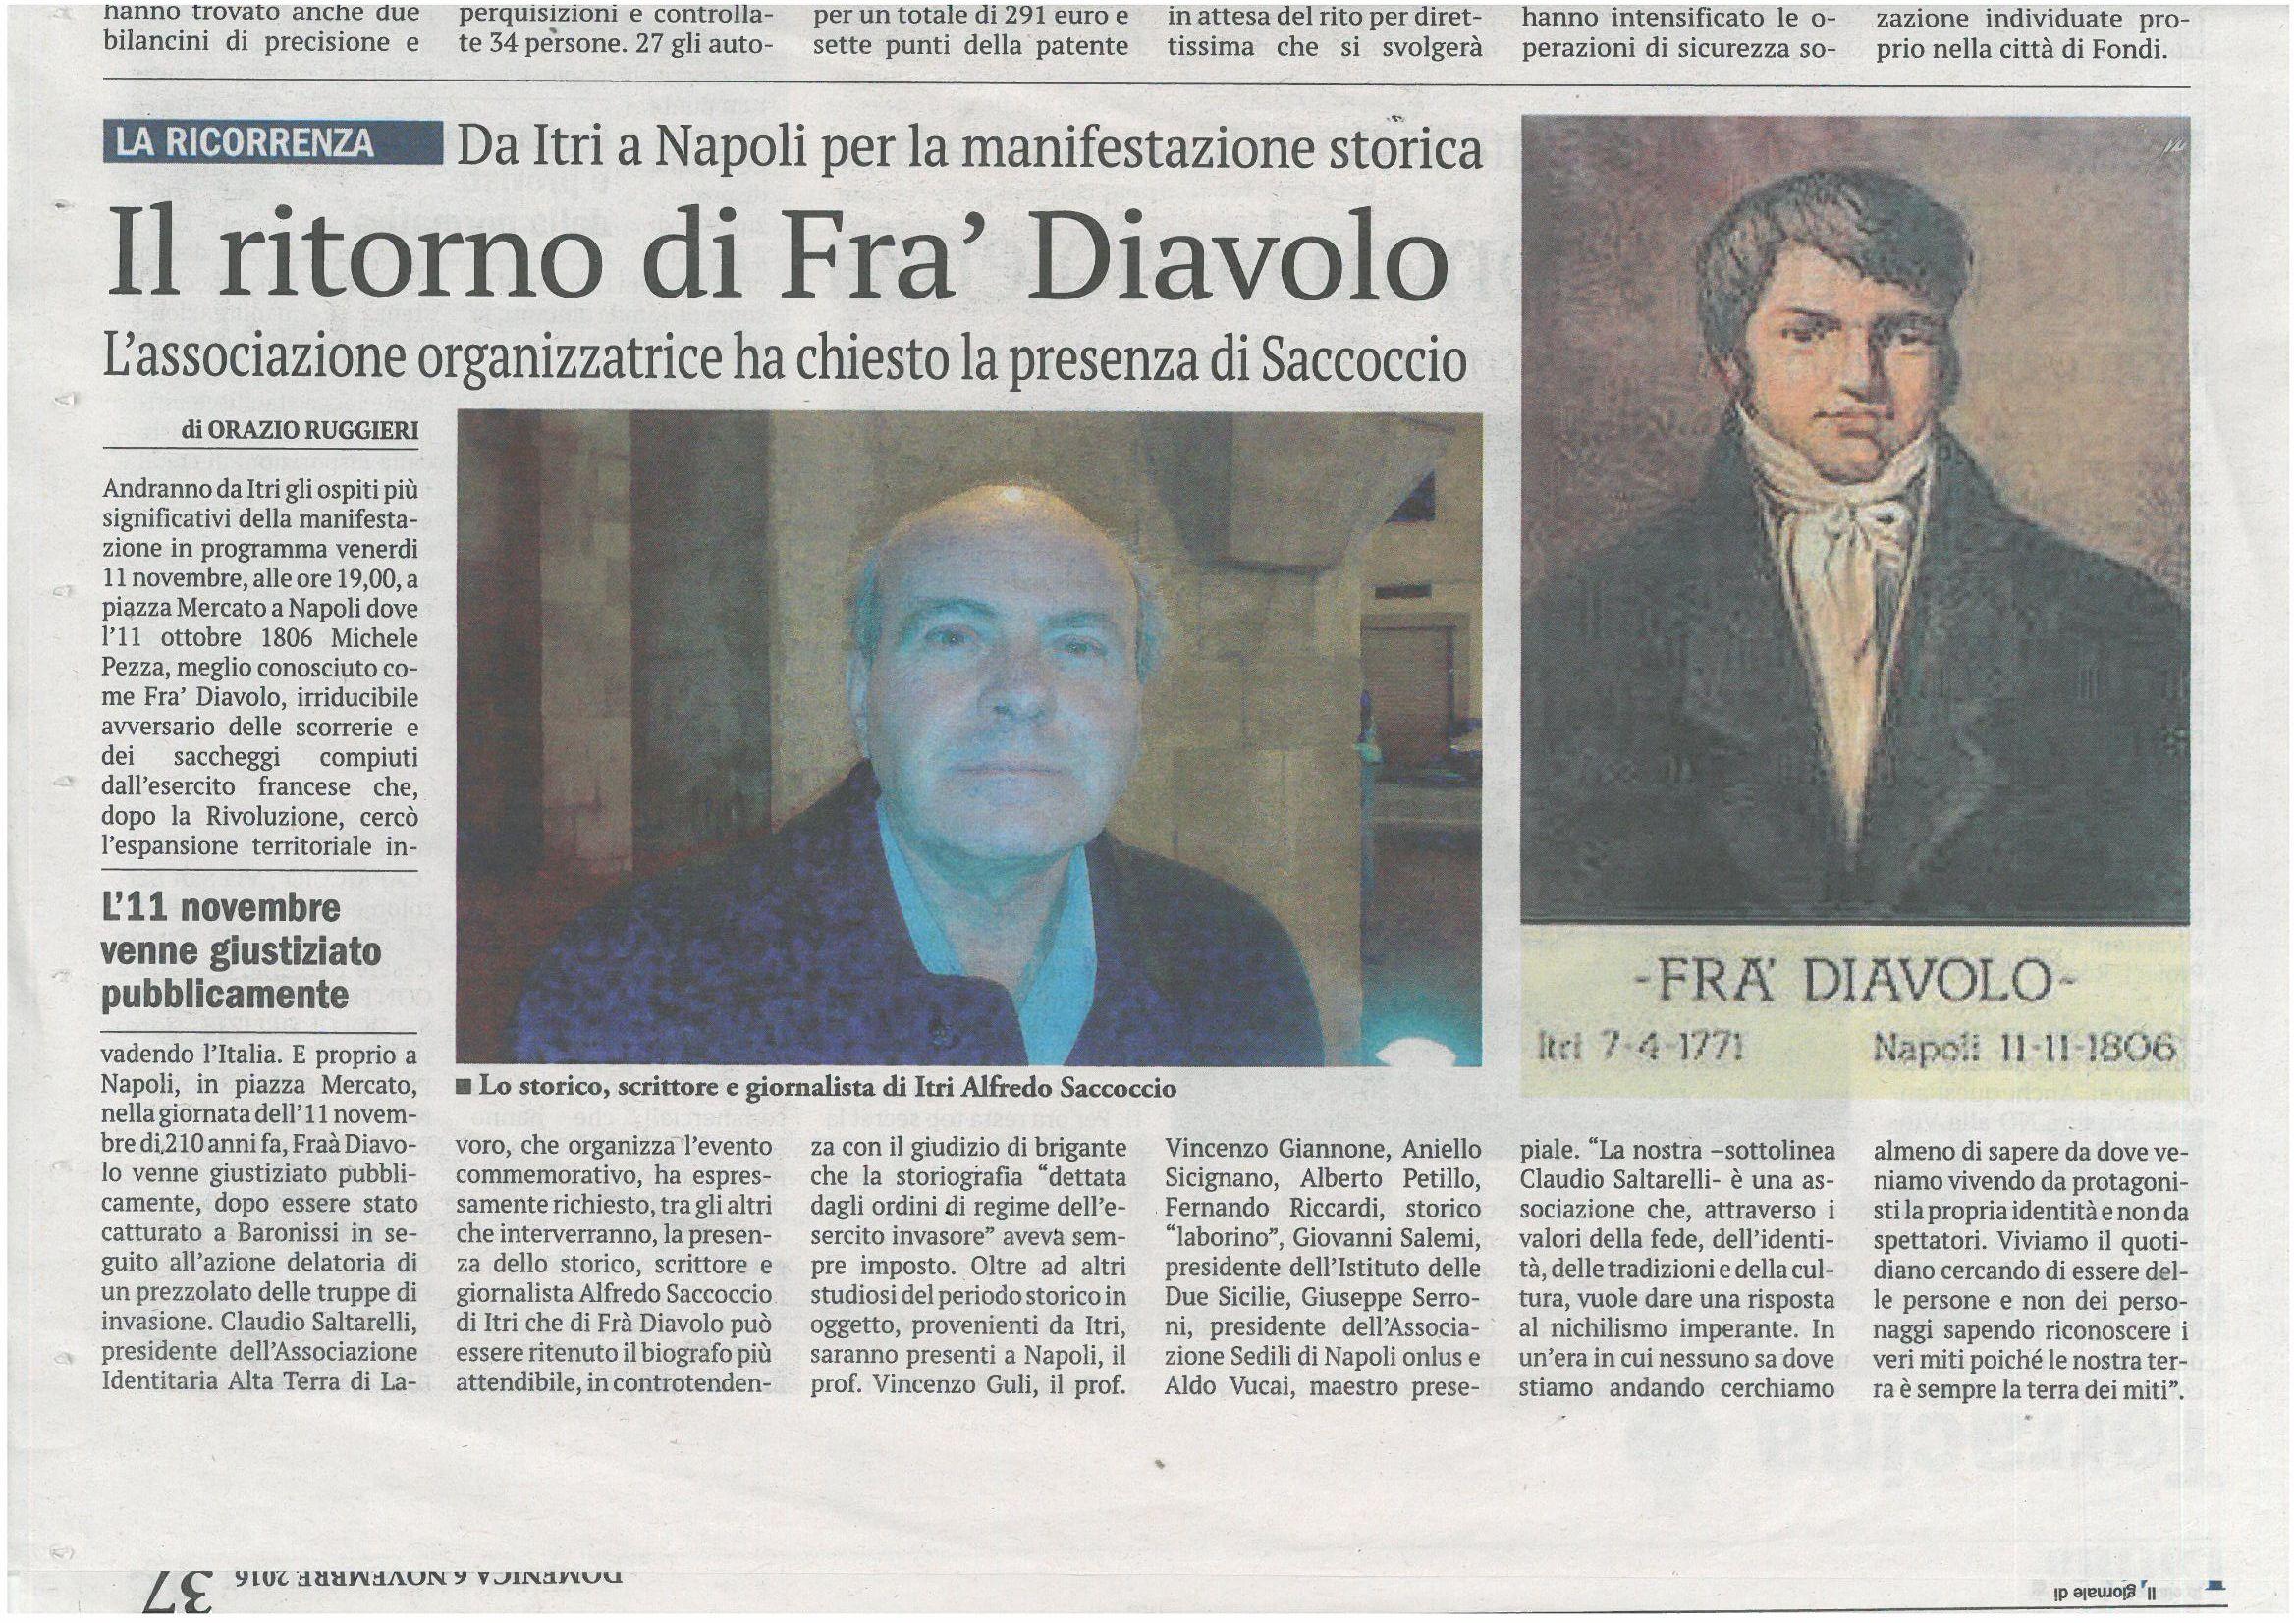 Articolo Saccoccio Fra Diavolo1